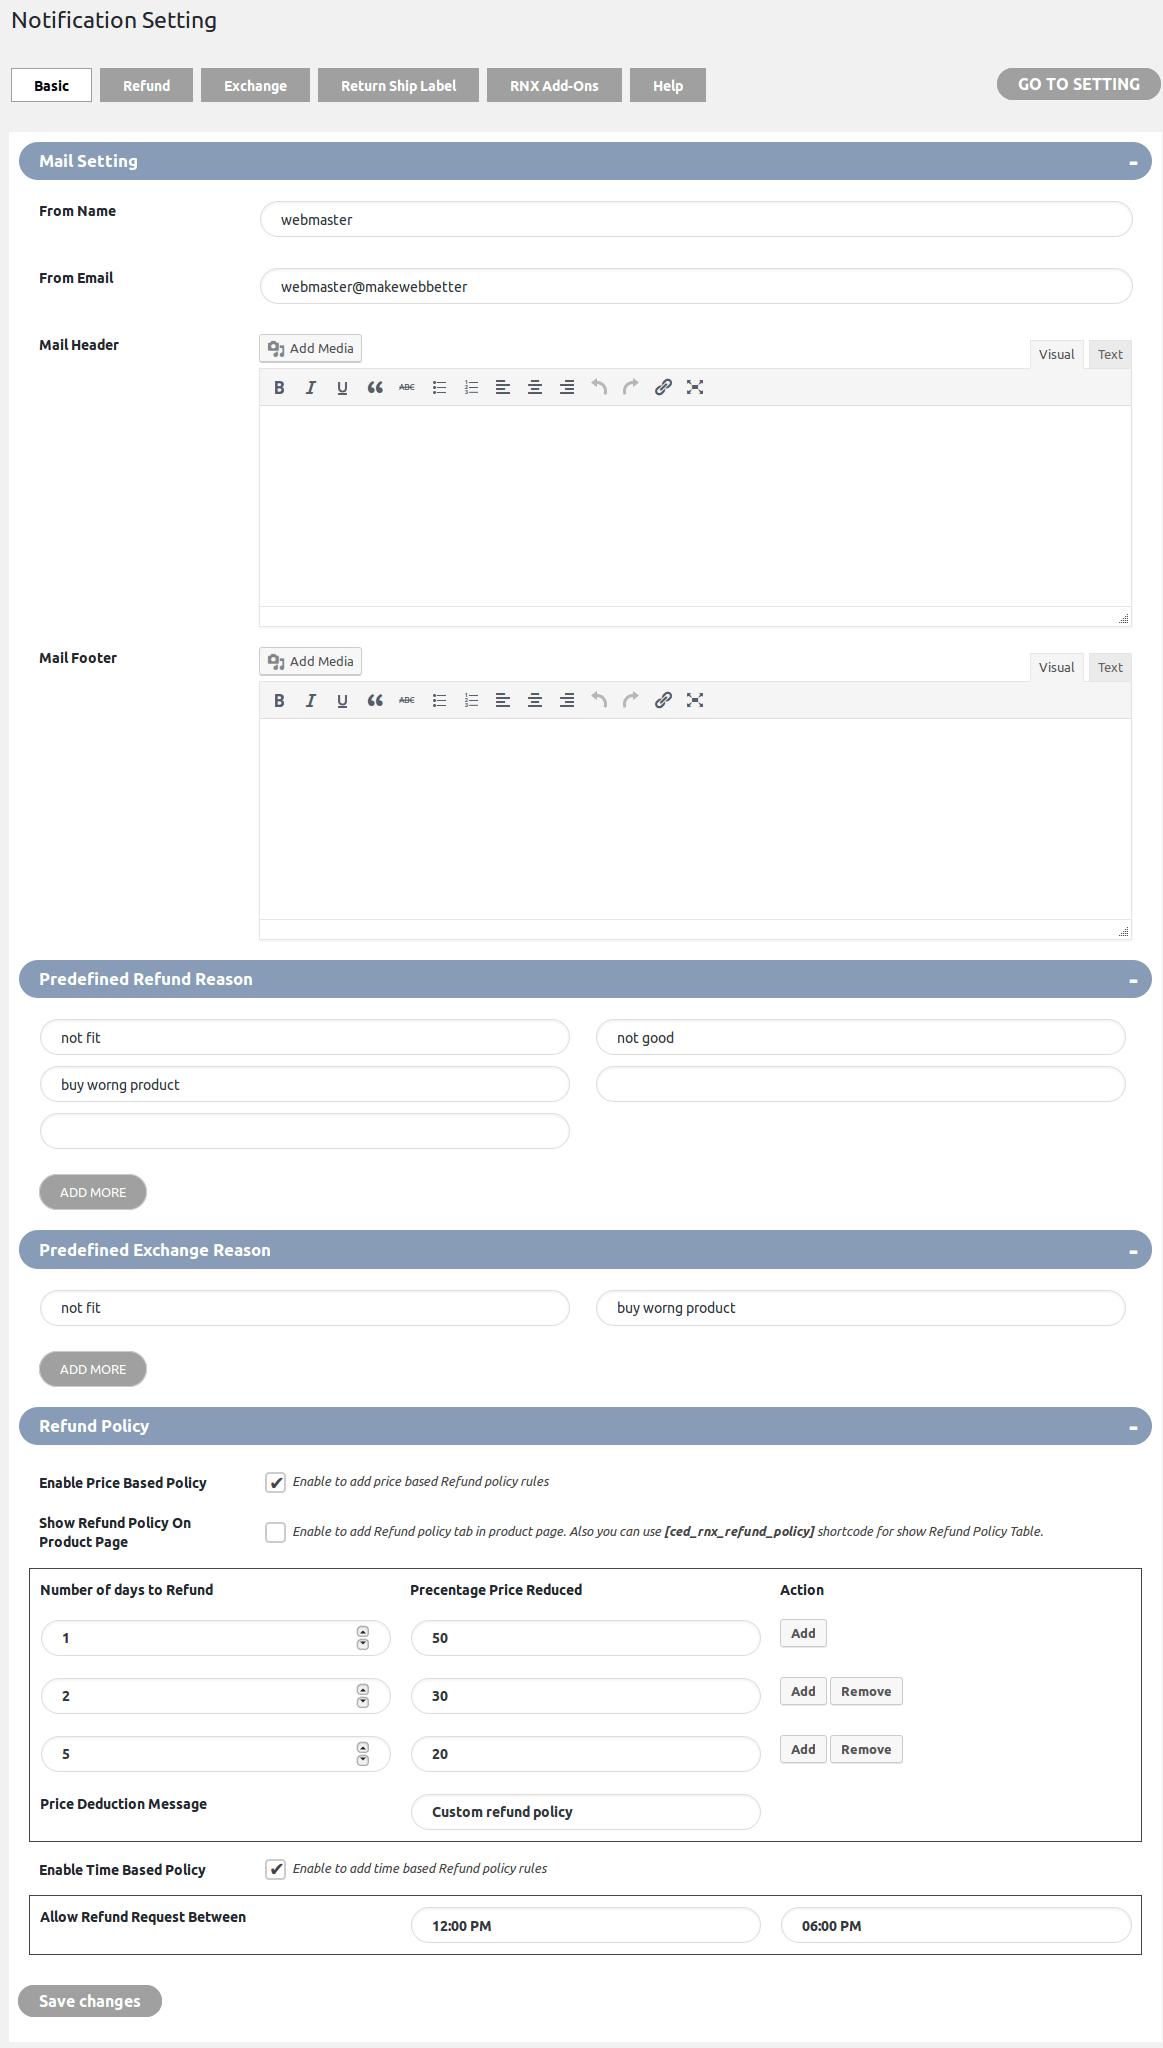 WooCommerce Refund And Exchange-BasicEmailNotification